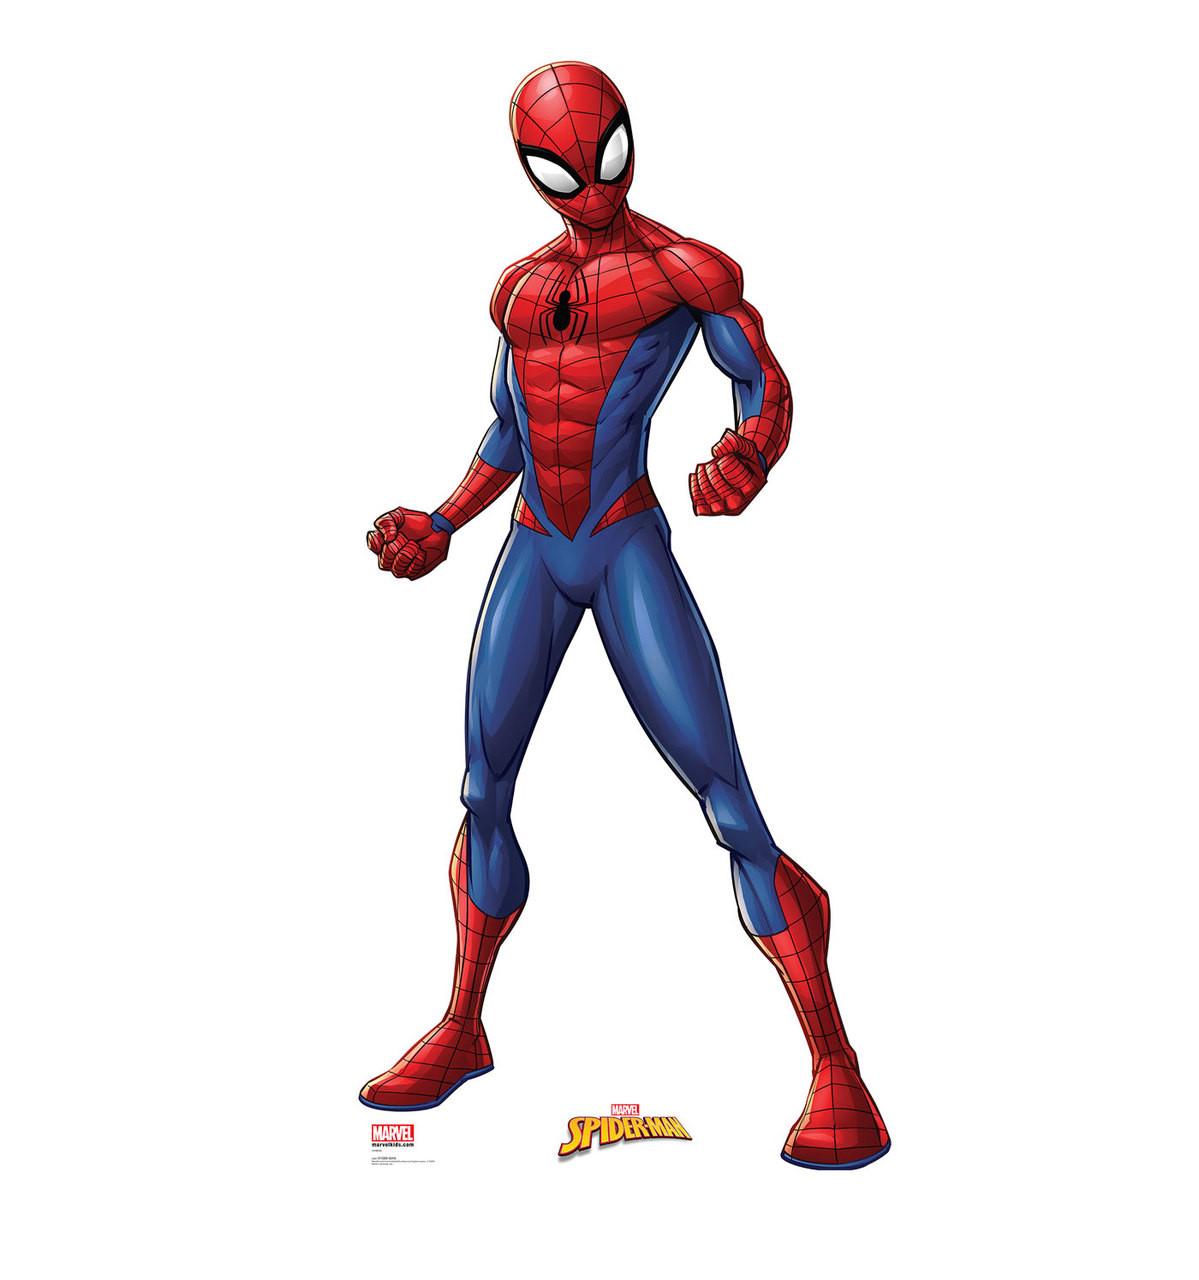 Spider Man 2017 Life-size Spide...